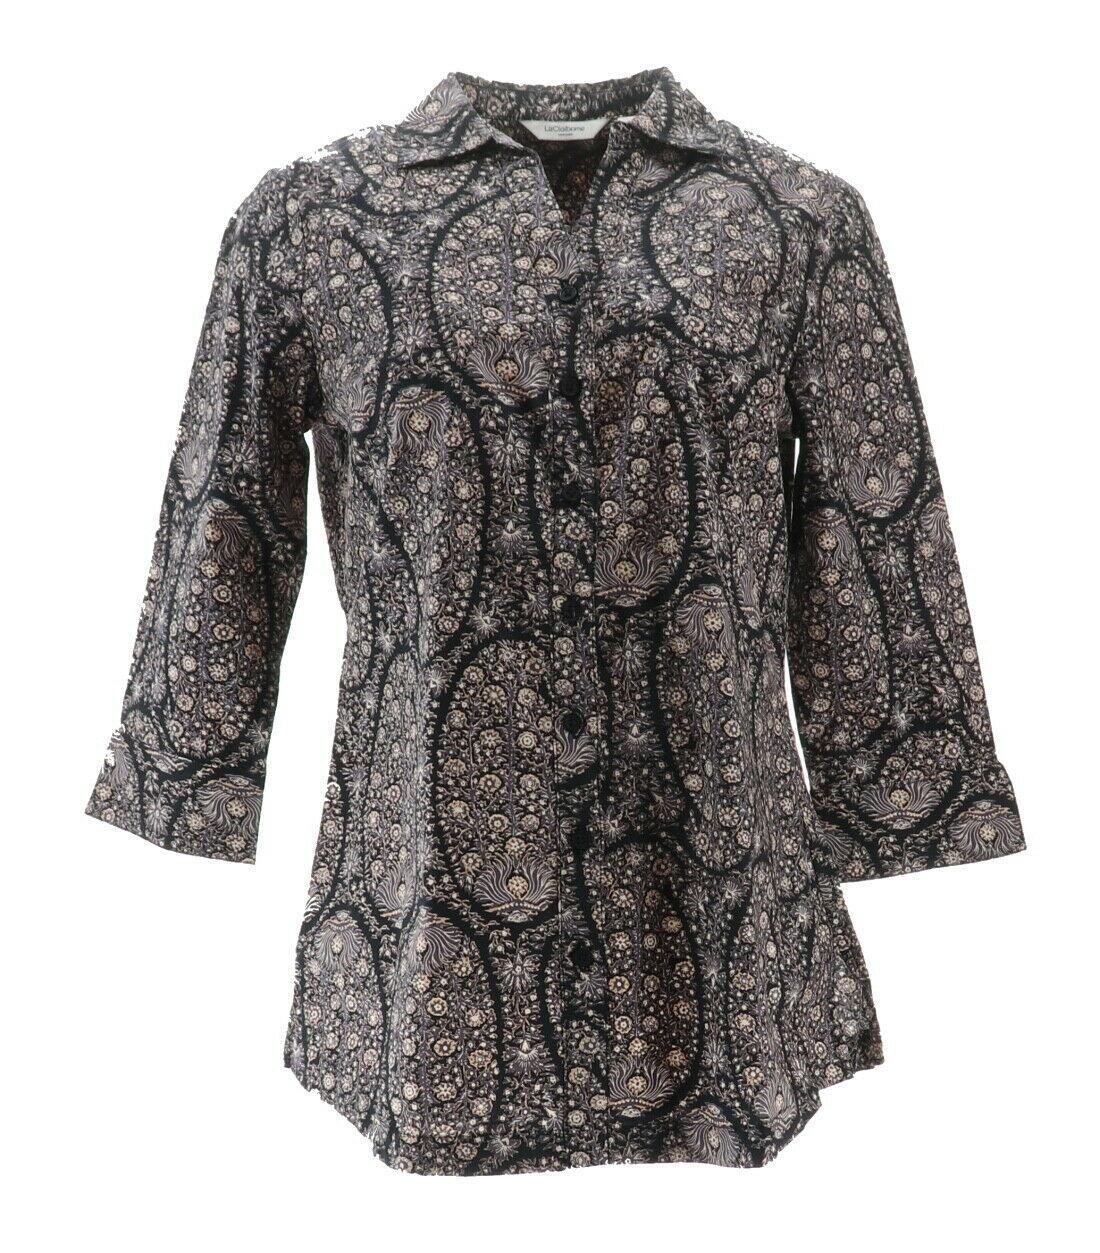 Liz Claiborne NY Paisley Printed Button Front Tunic Black Multi 6 NEW A267257 - $27.70